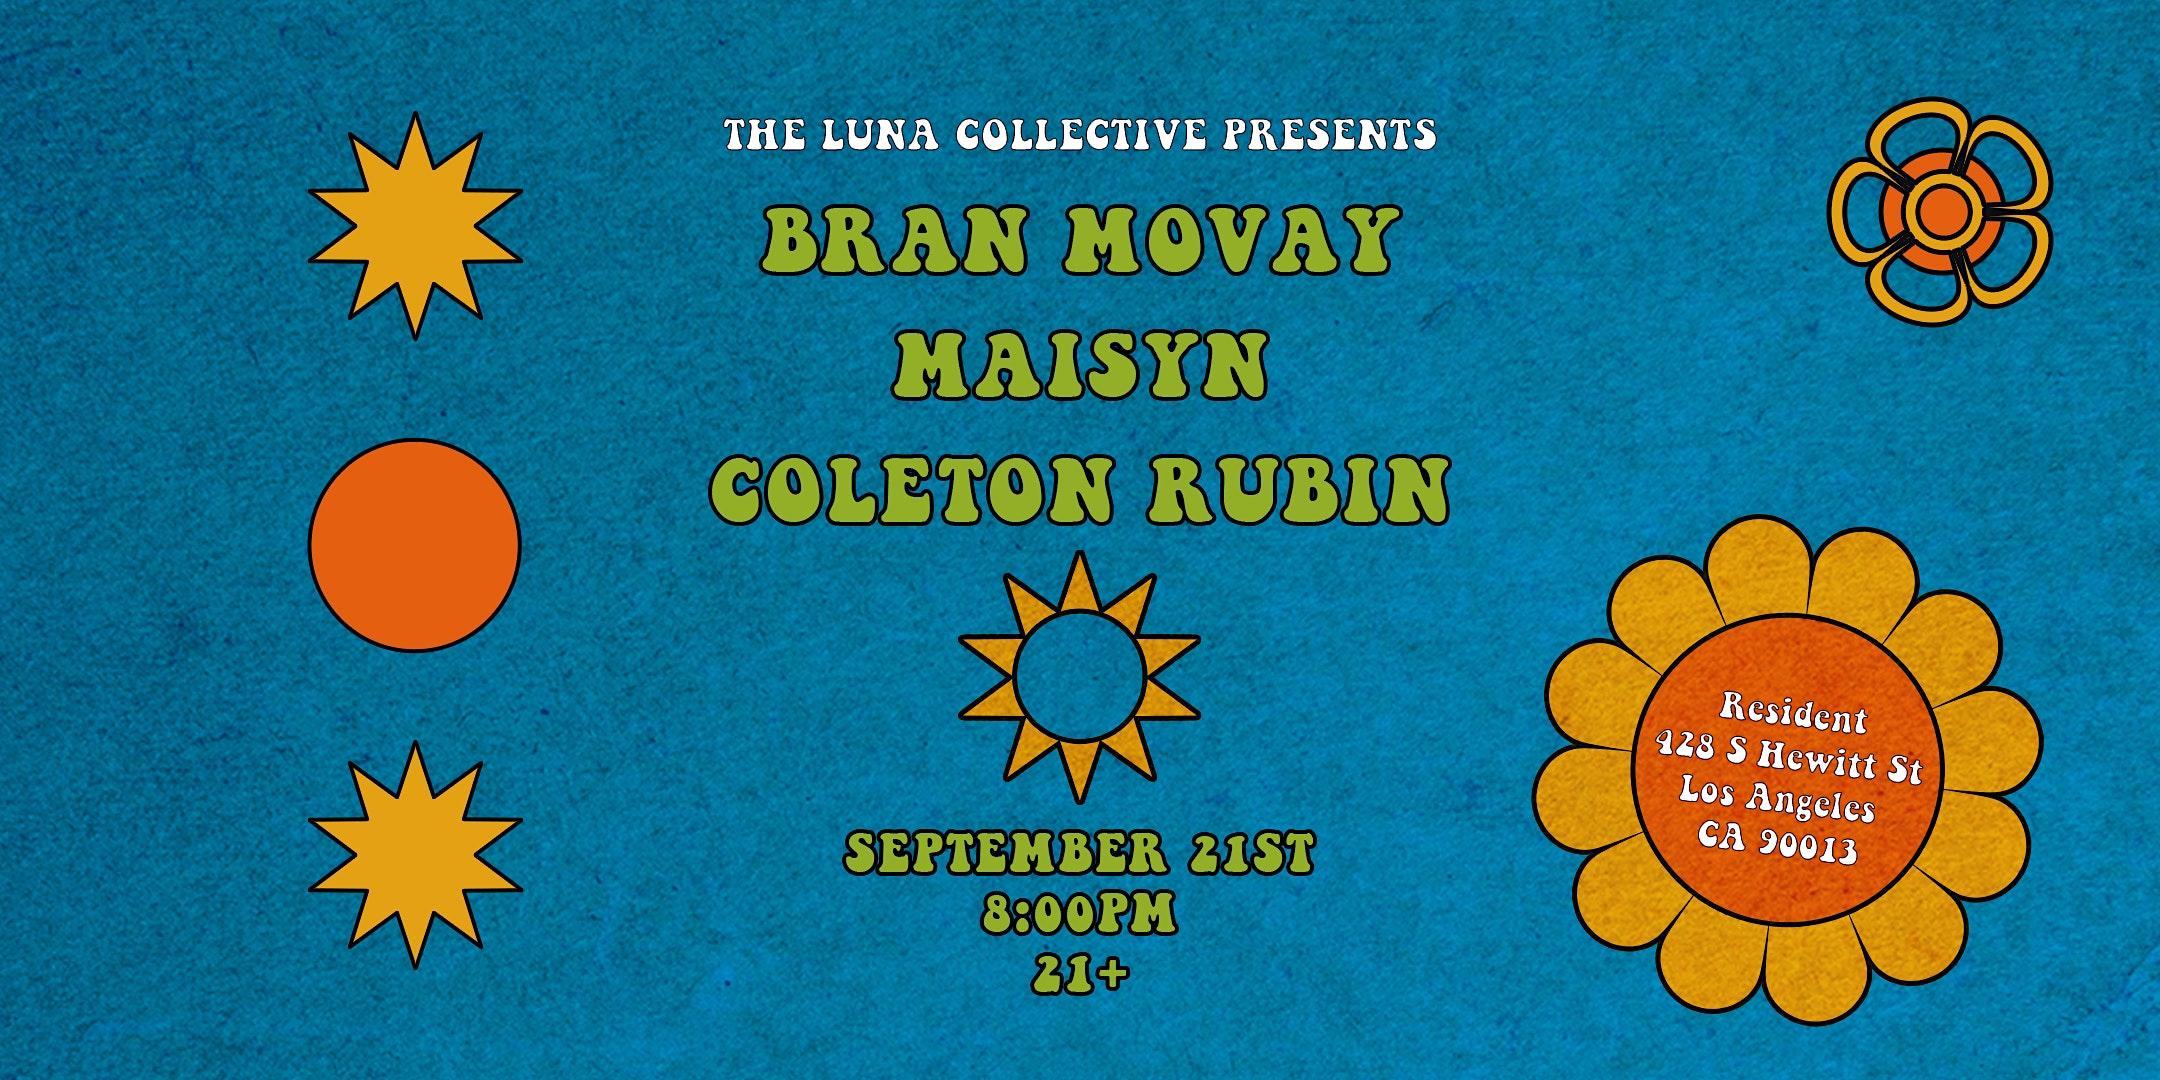 Bran Movay - Maisyn - Coleton Rubin